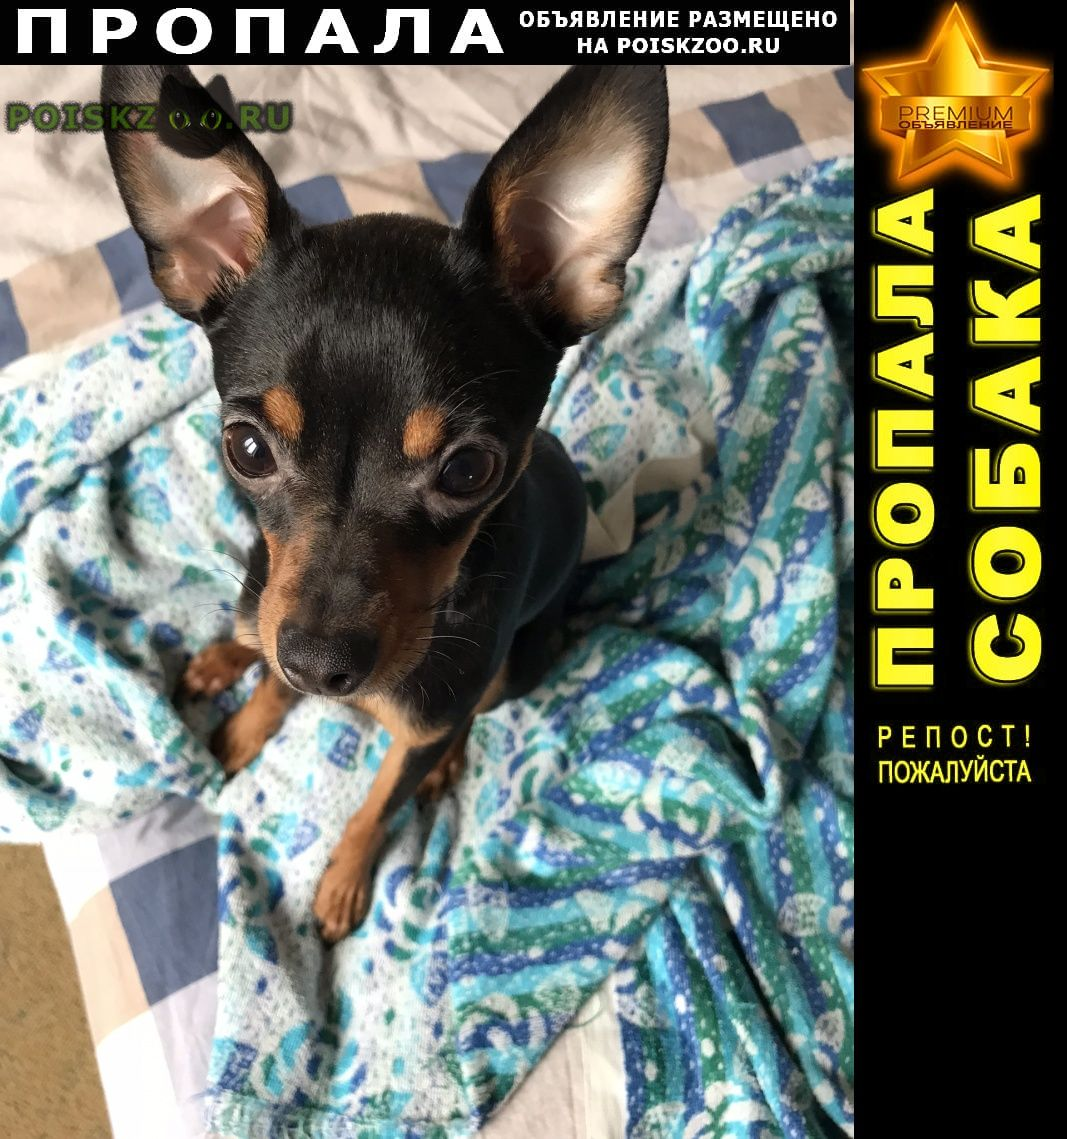 Пропала собака кобель розыск г.Анапа